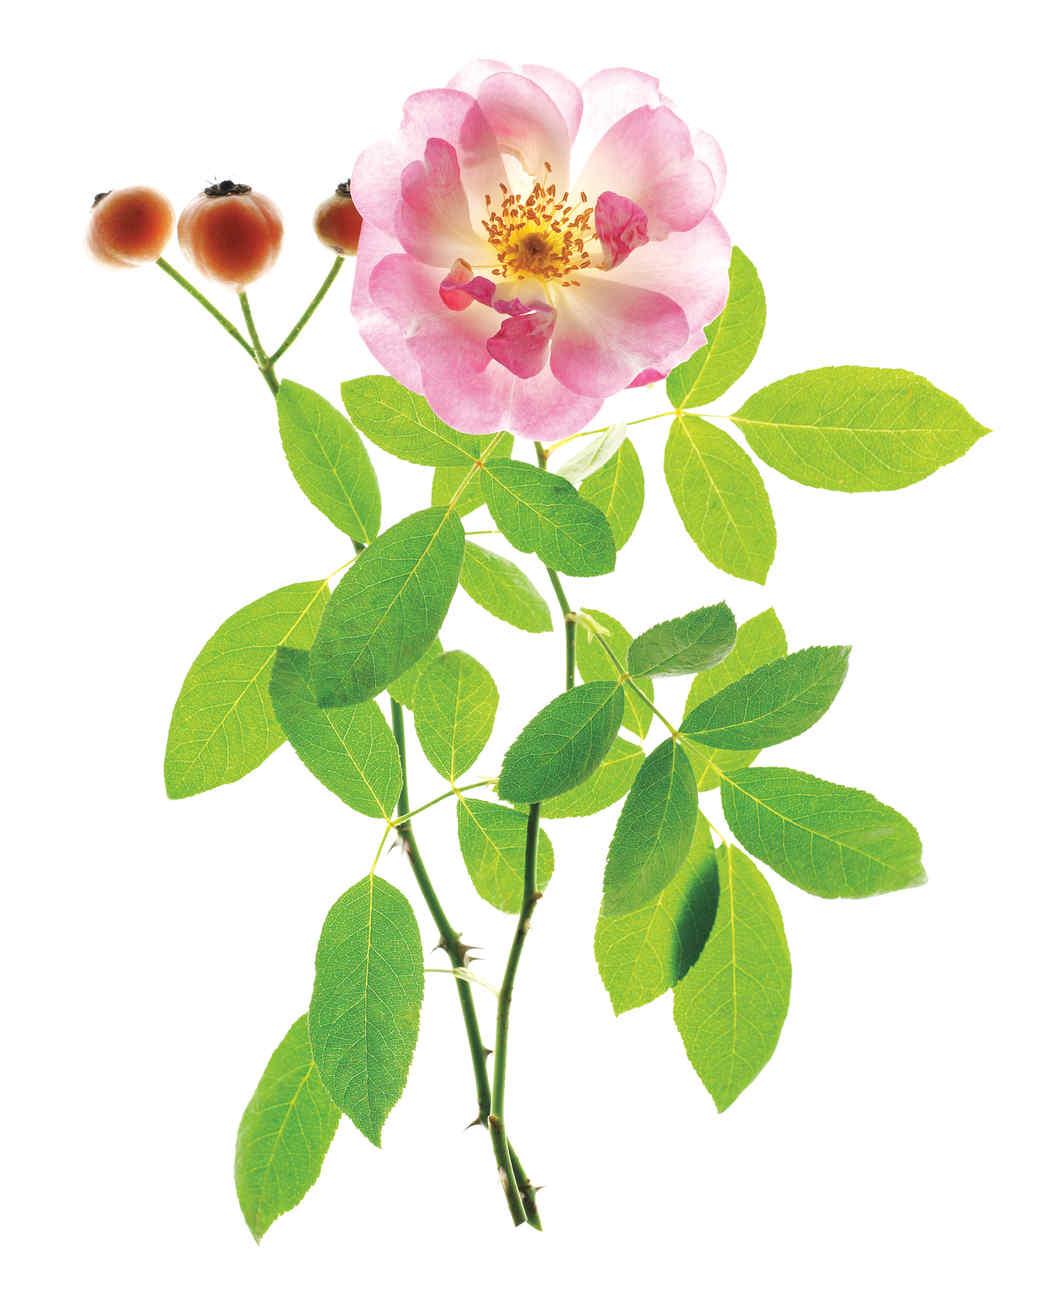 erfurt-rose-ms108508.jpg